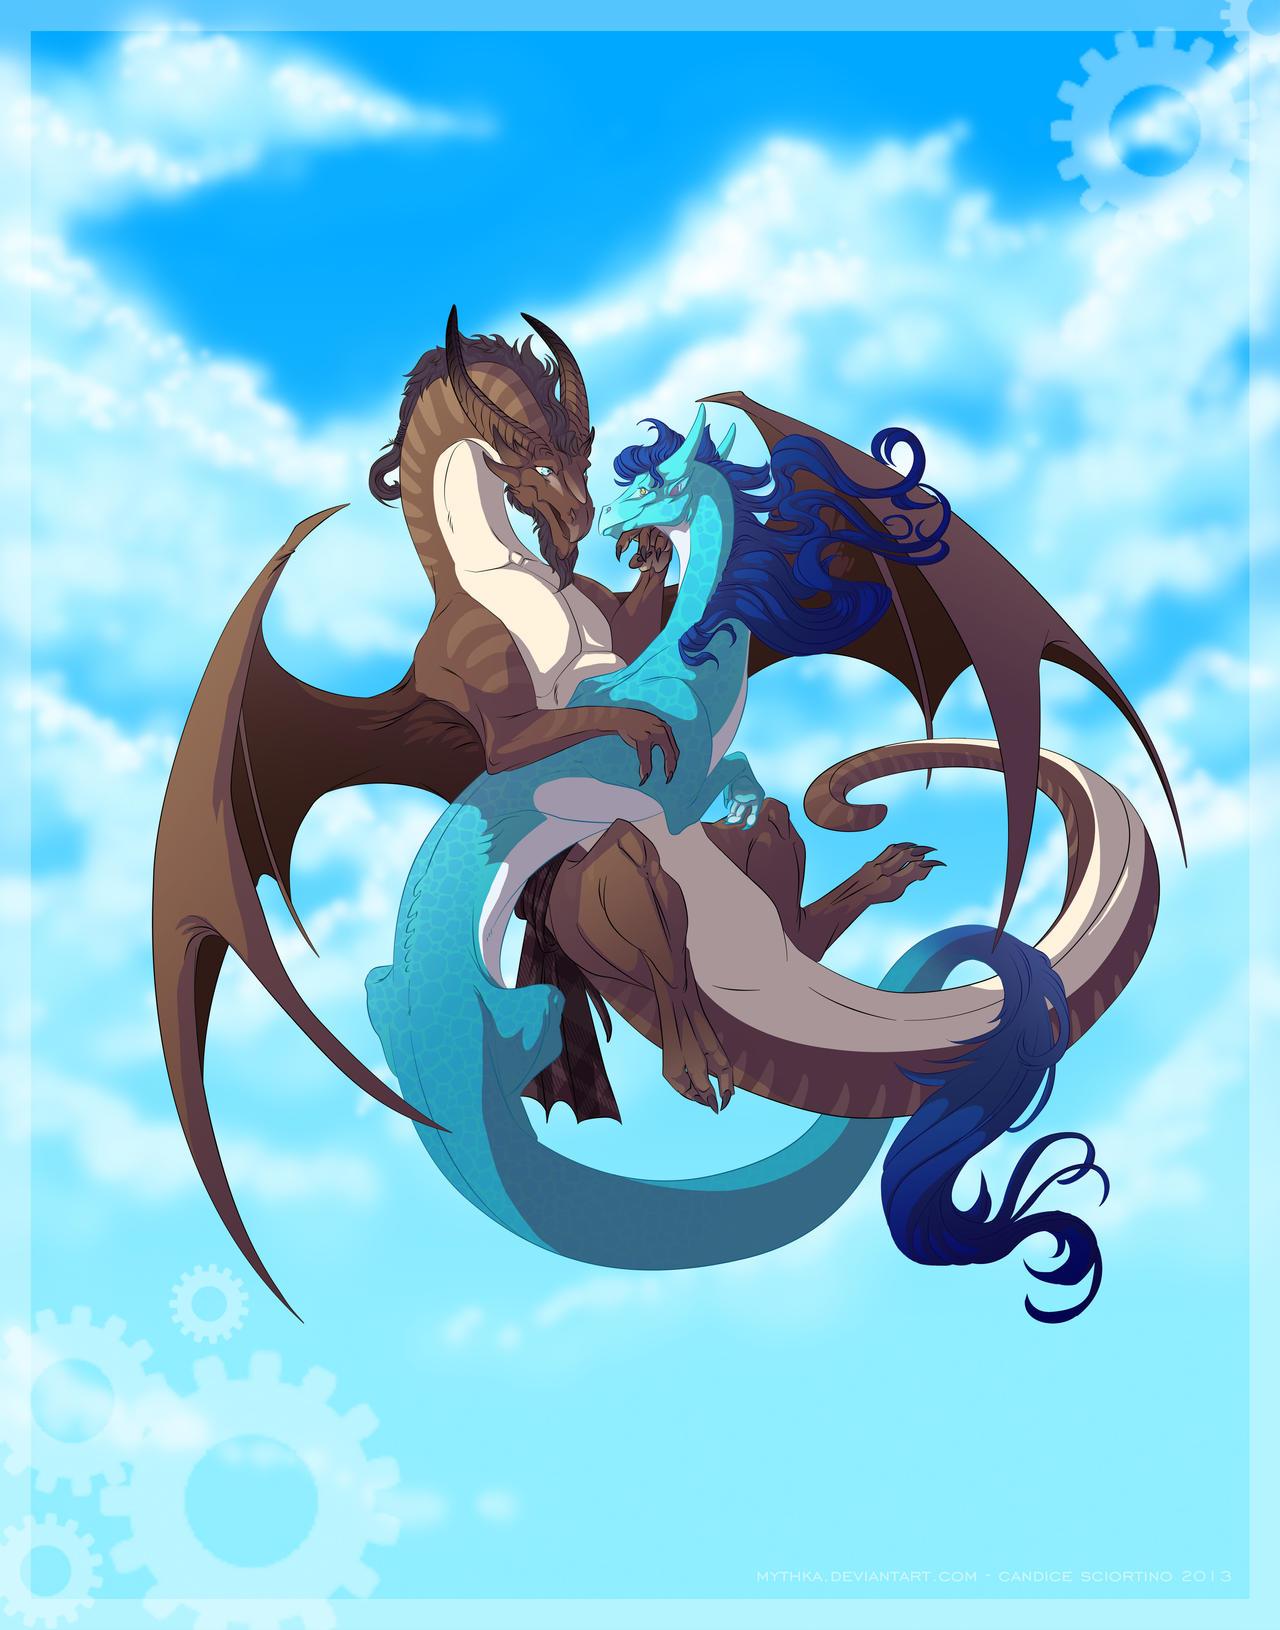 I Adore You by Mythka